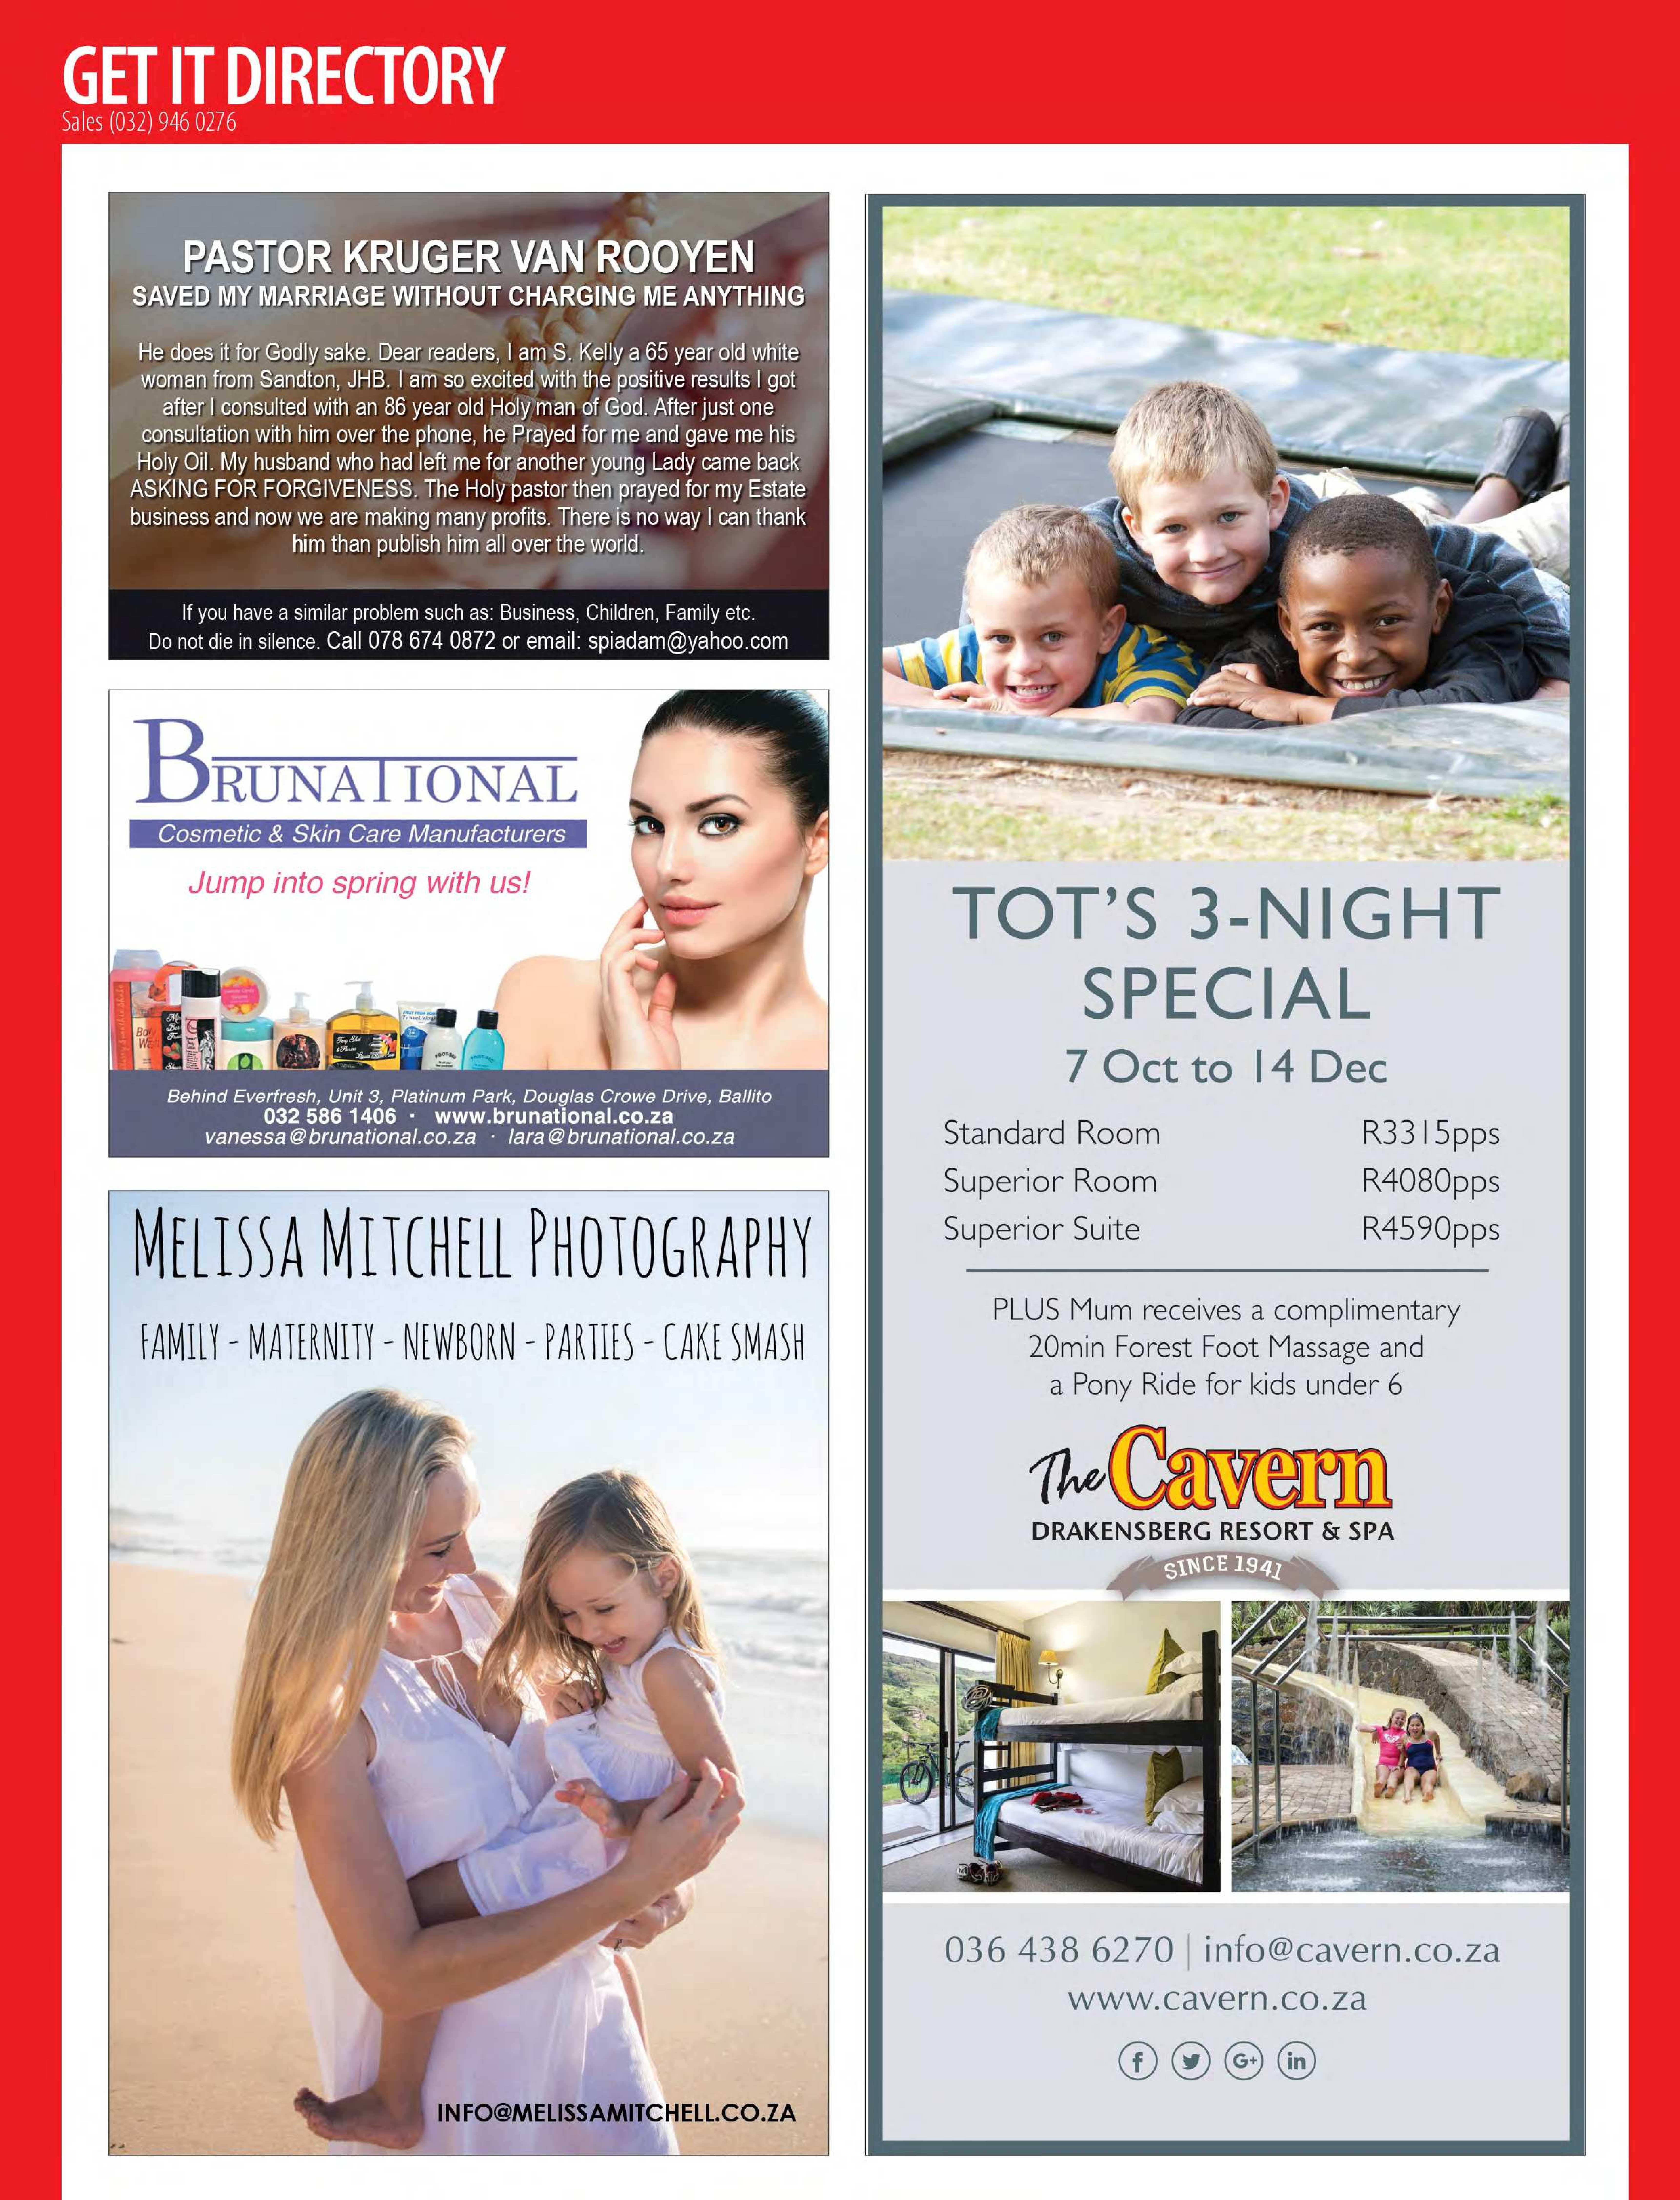 get-magazine-ballitoumhlanga-september-2018-epapers-page-62